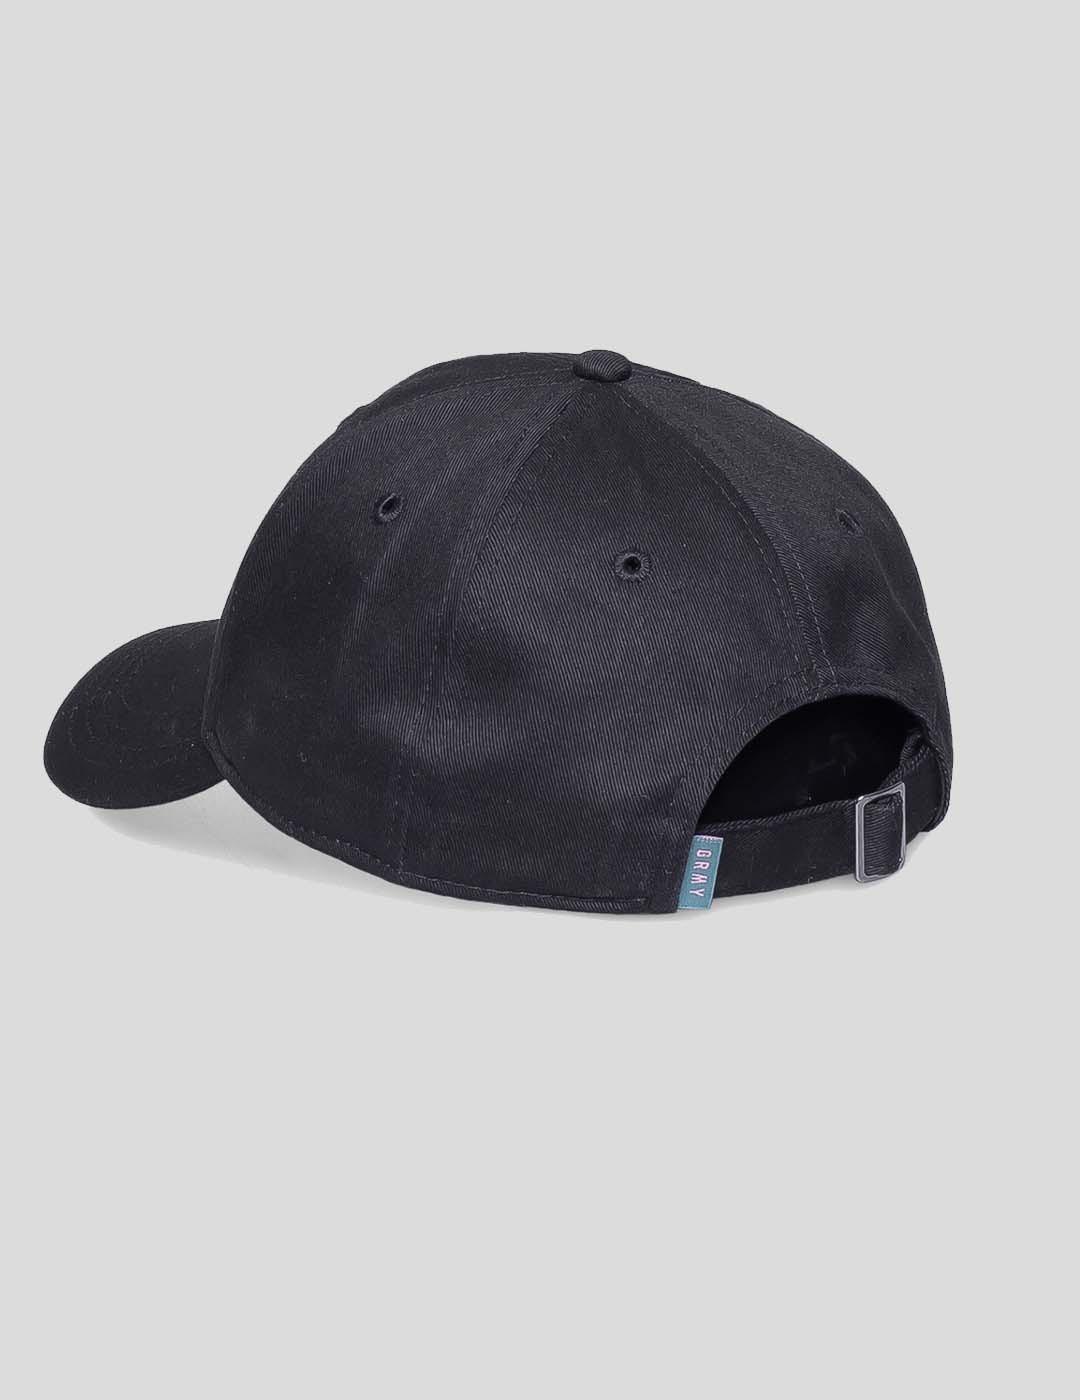 GORRA GRIMEY FRENZY CURVED VISOR CAP BLACK